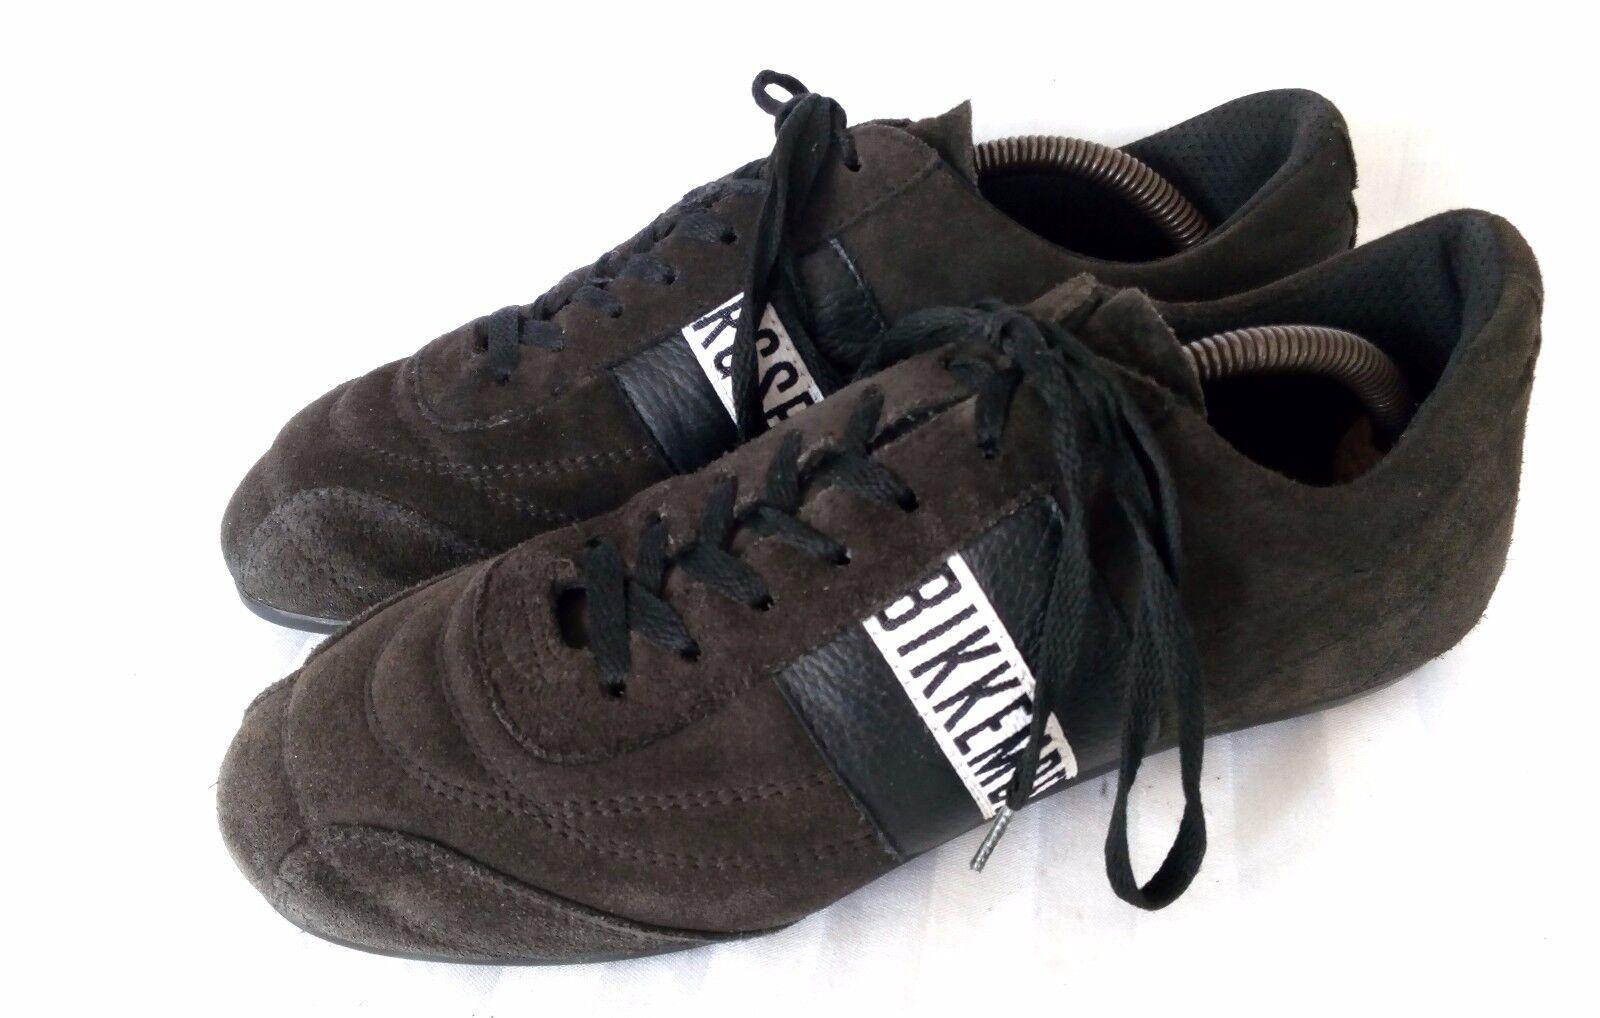 Bikkembergs UNISEX Halbschuhe Schnürschuhe Sneaker Braun Wildlleder Gr. 39 TOP